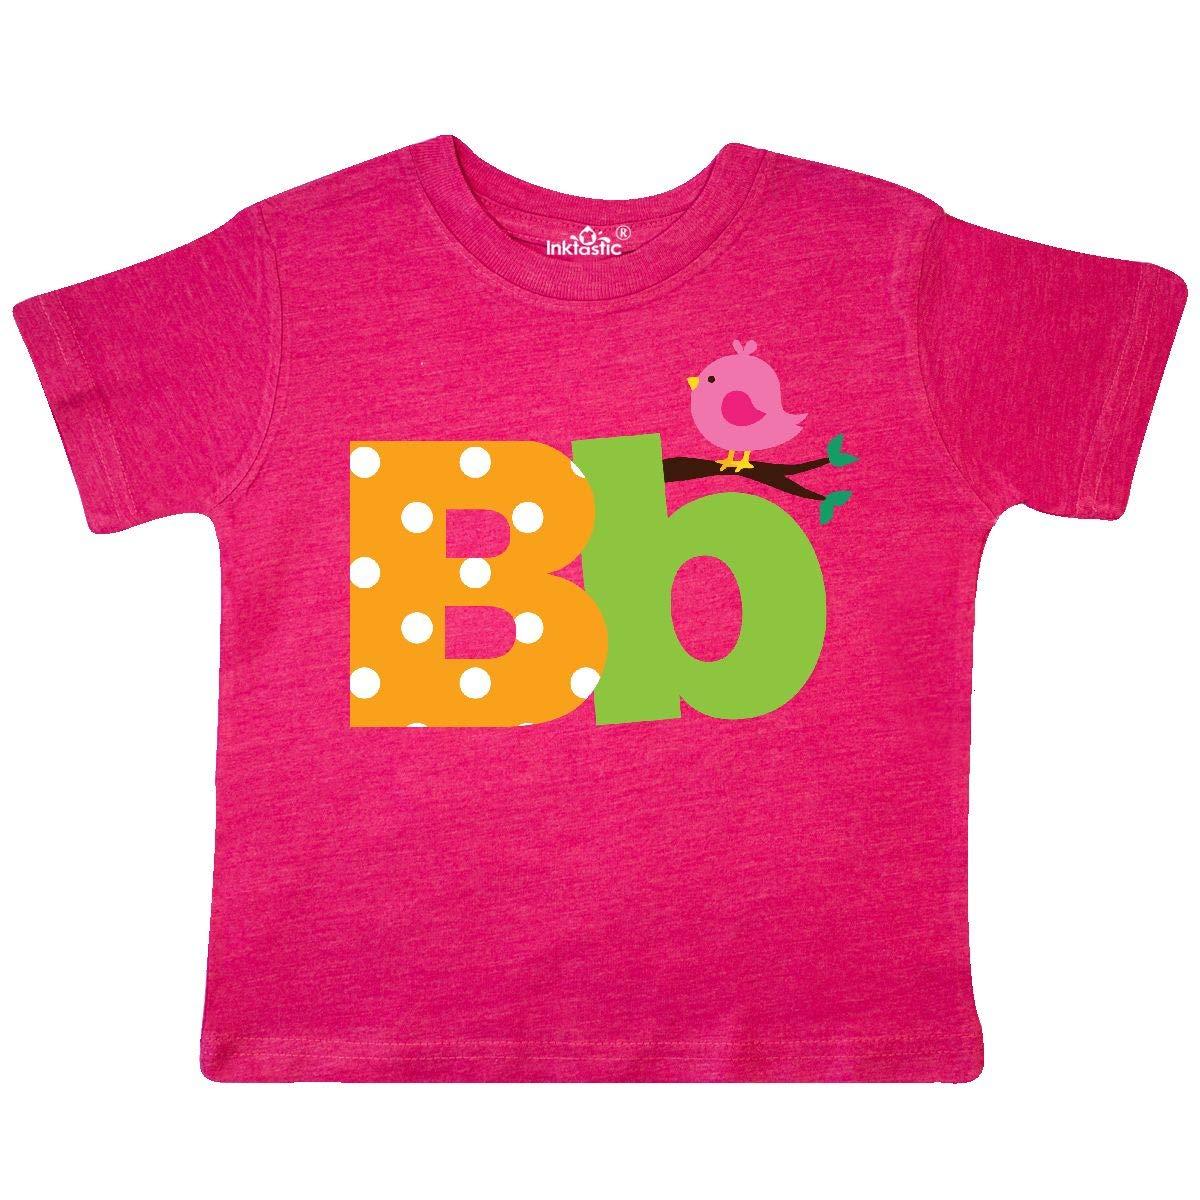 inktastic Alphabet Letter B with Bird Toddler T-Shirt